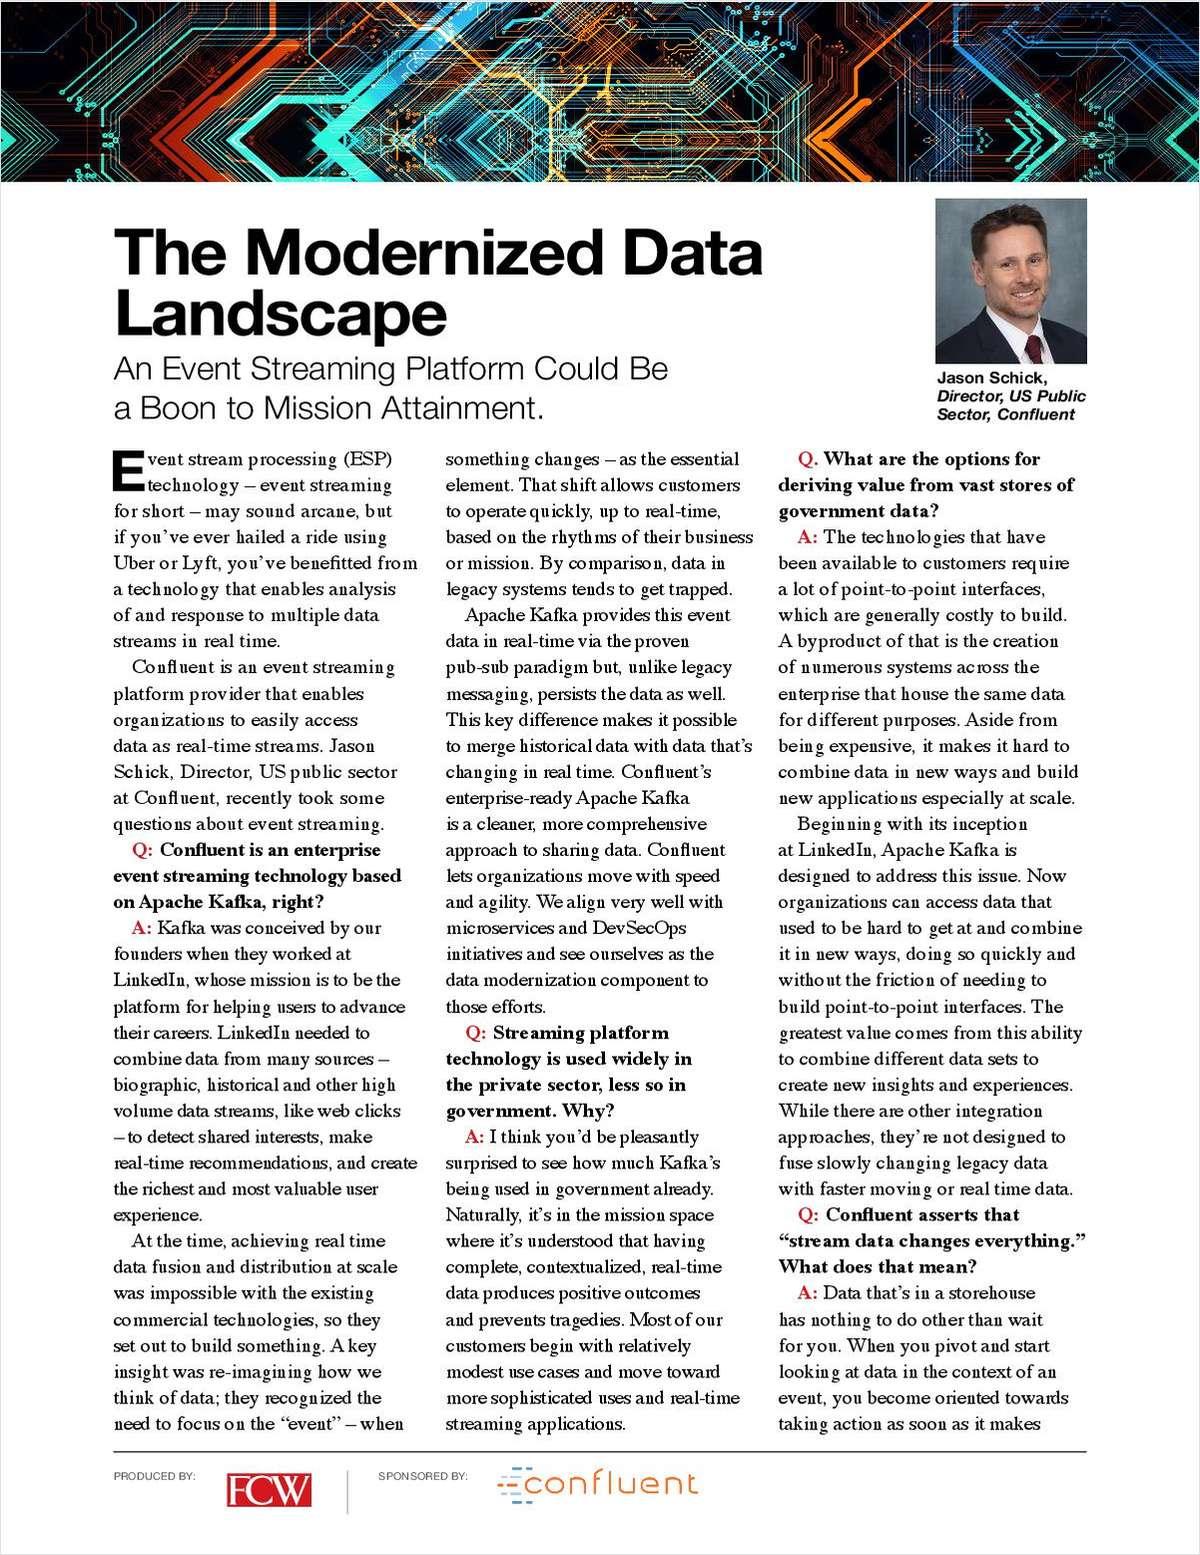 Federal Computer Week: The Modernized Data Landscape